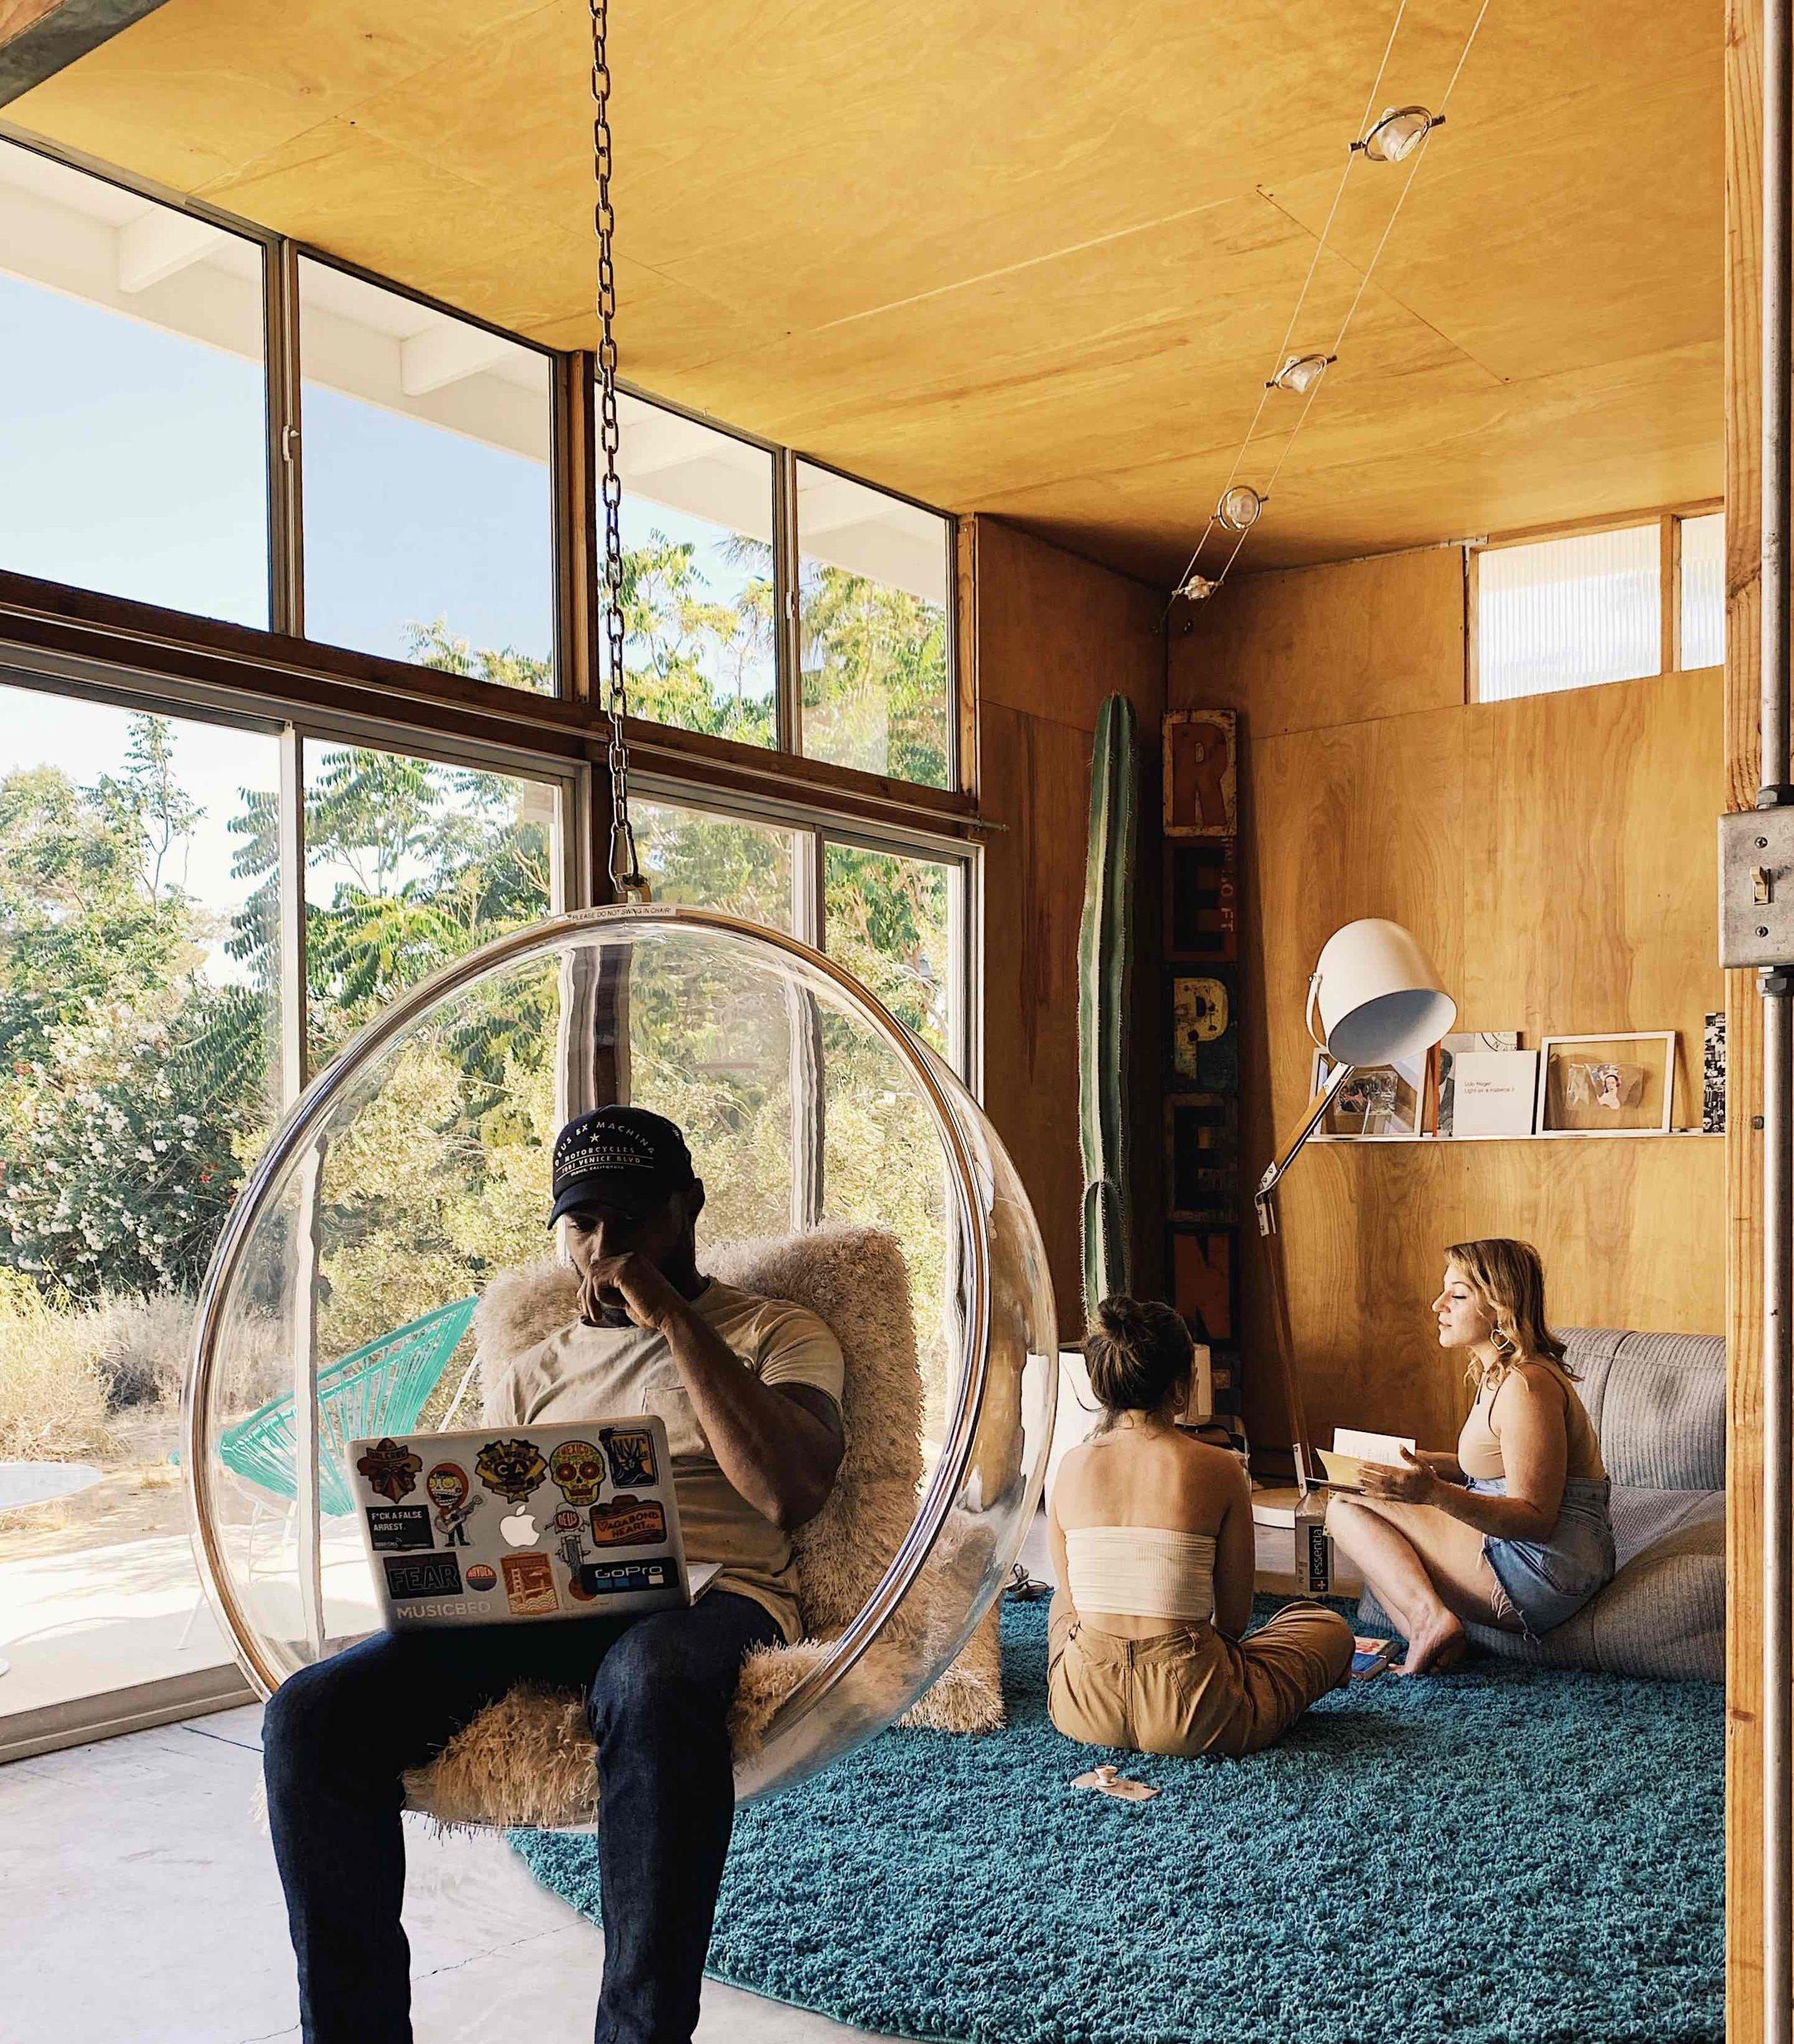 airbnb-art loft-joshua tree - cj johnson - cjjohnsonjr - 10.jpg